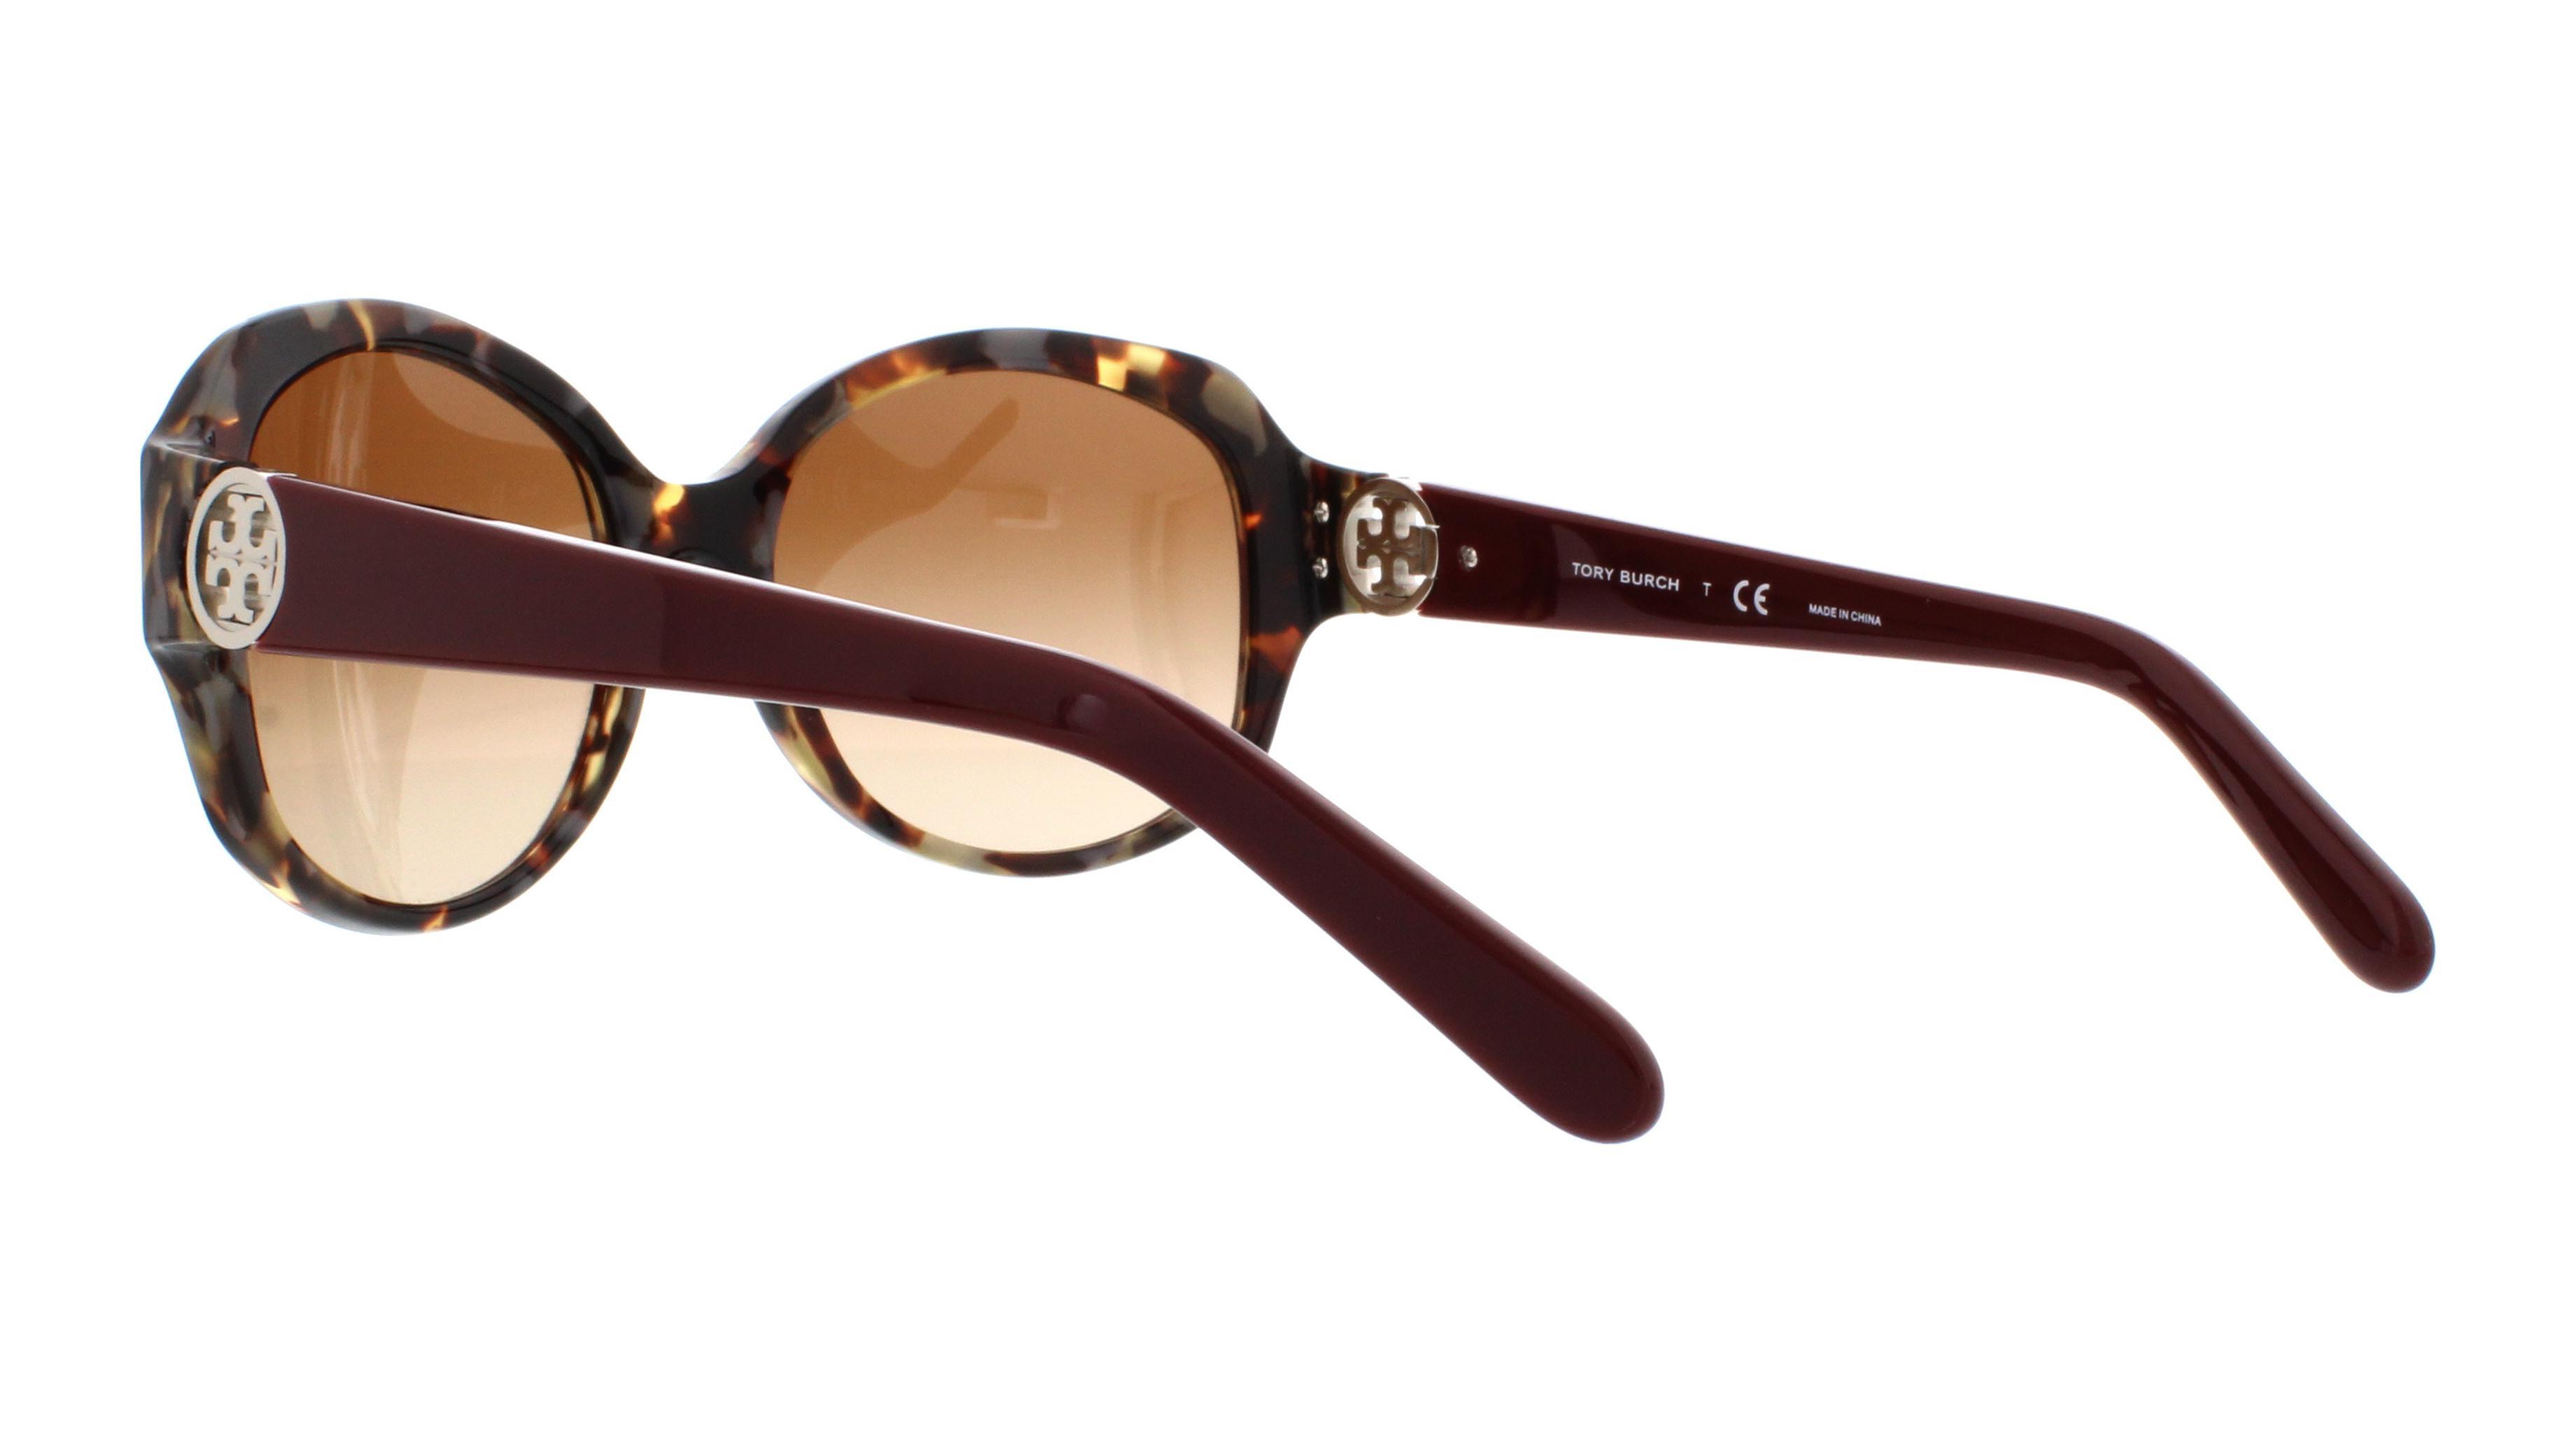 de804a368163 tory burch birthday coupon 2016 tory burch eyewear luxottica tory ...